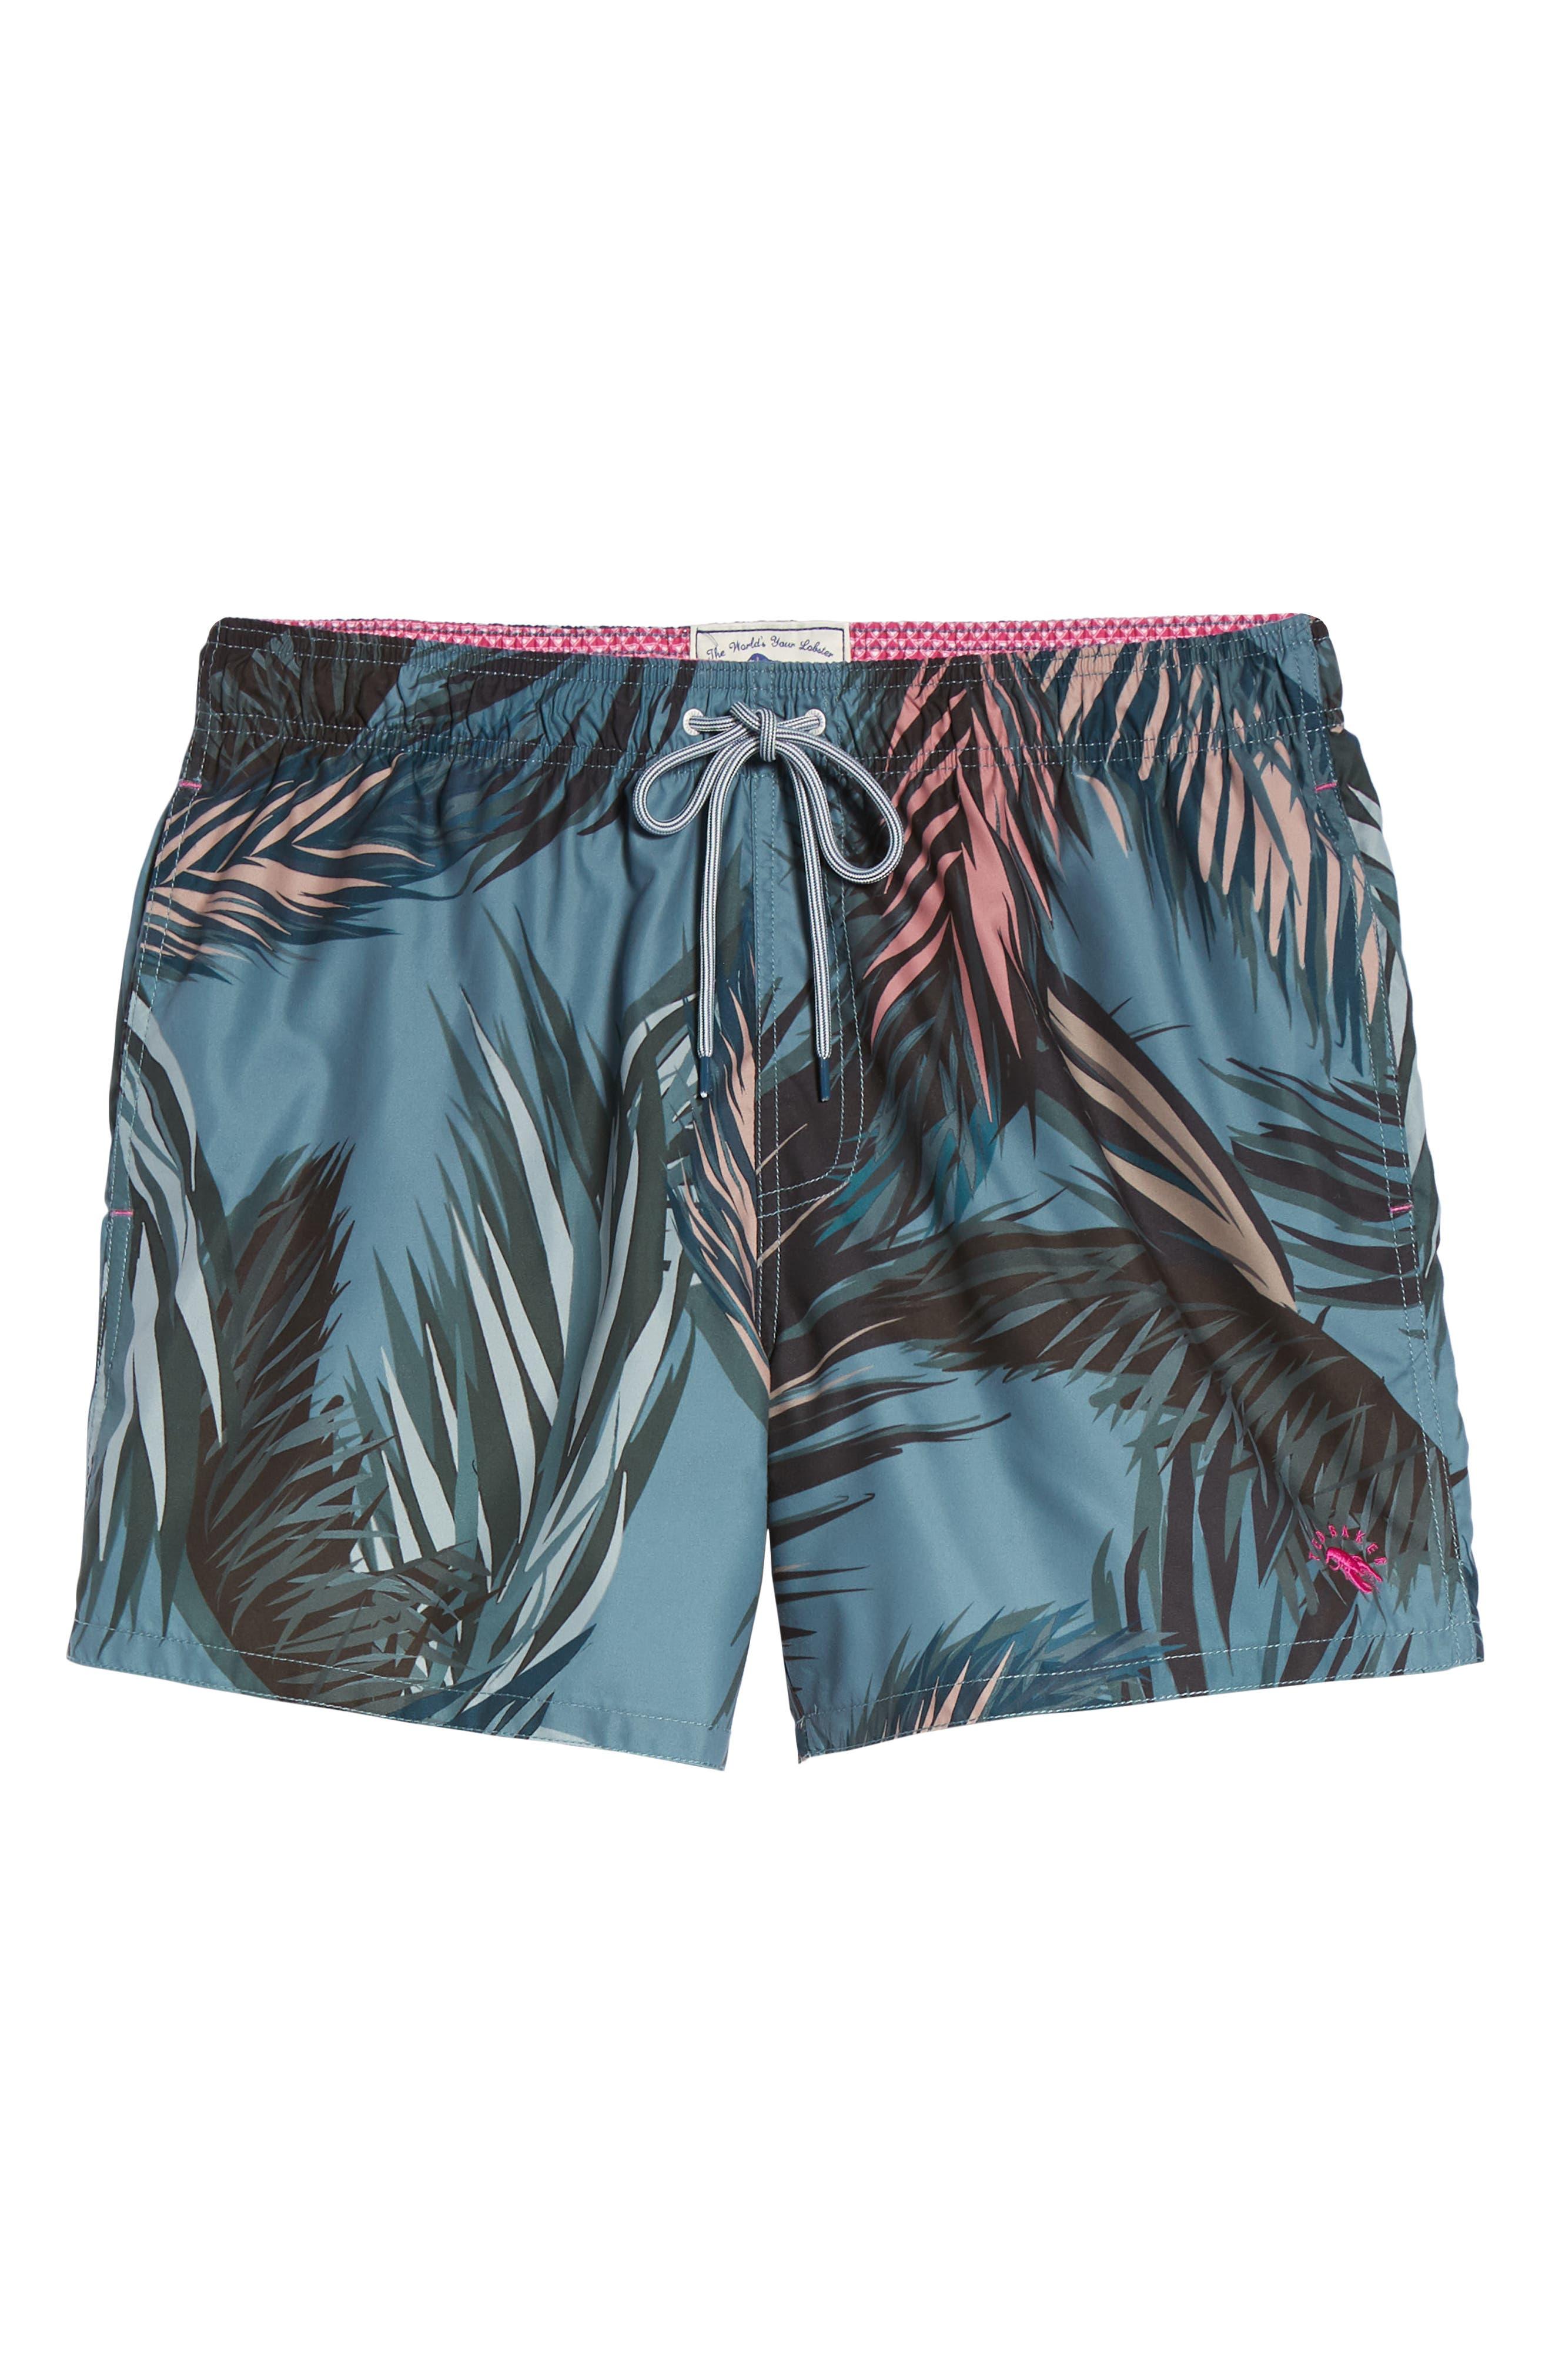 Raynebo Slim Fit Palm Leaf Swim Trunks,                             Alternate thumbnail 6, color,                             Dark Green